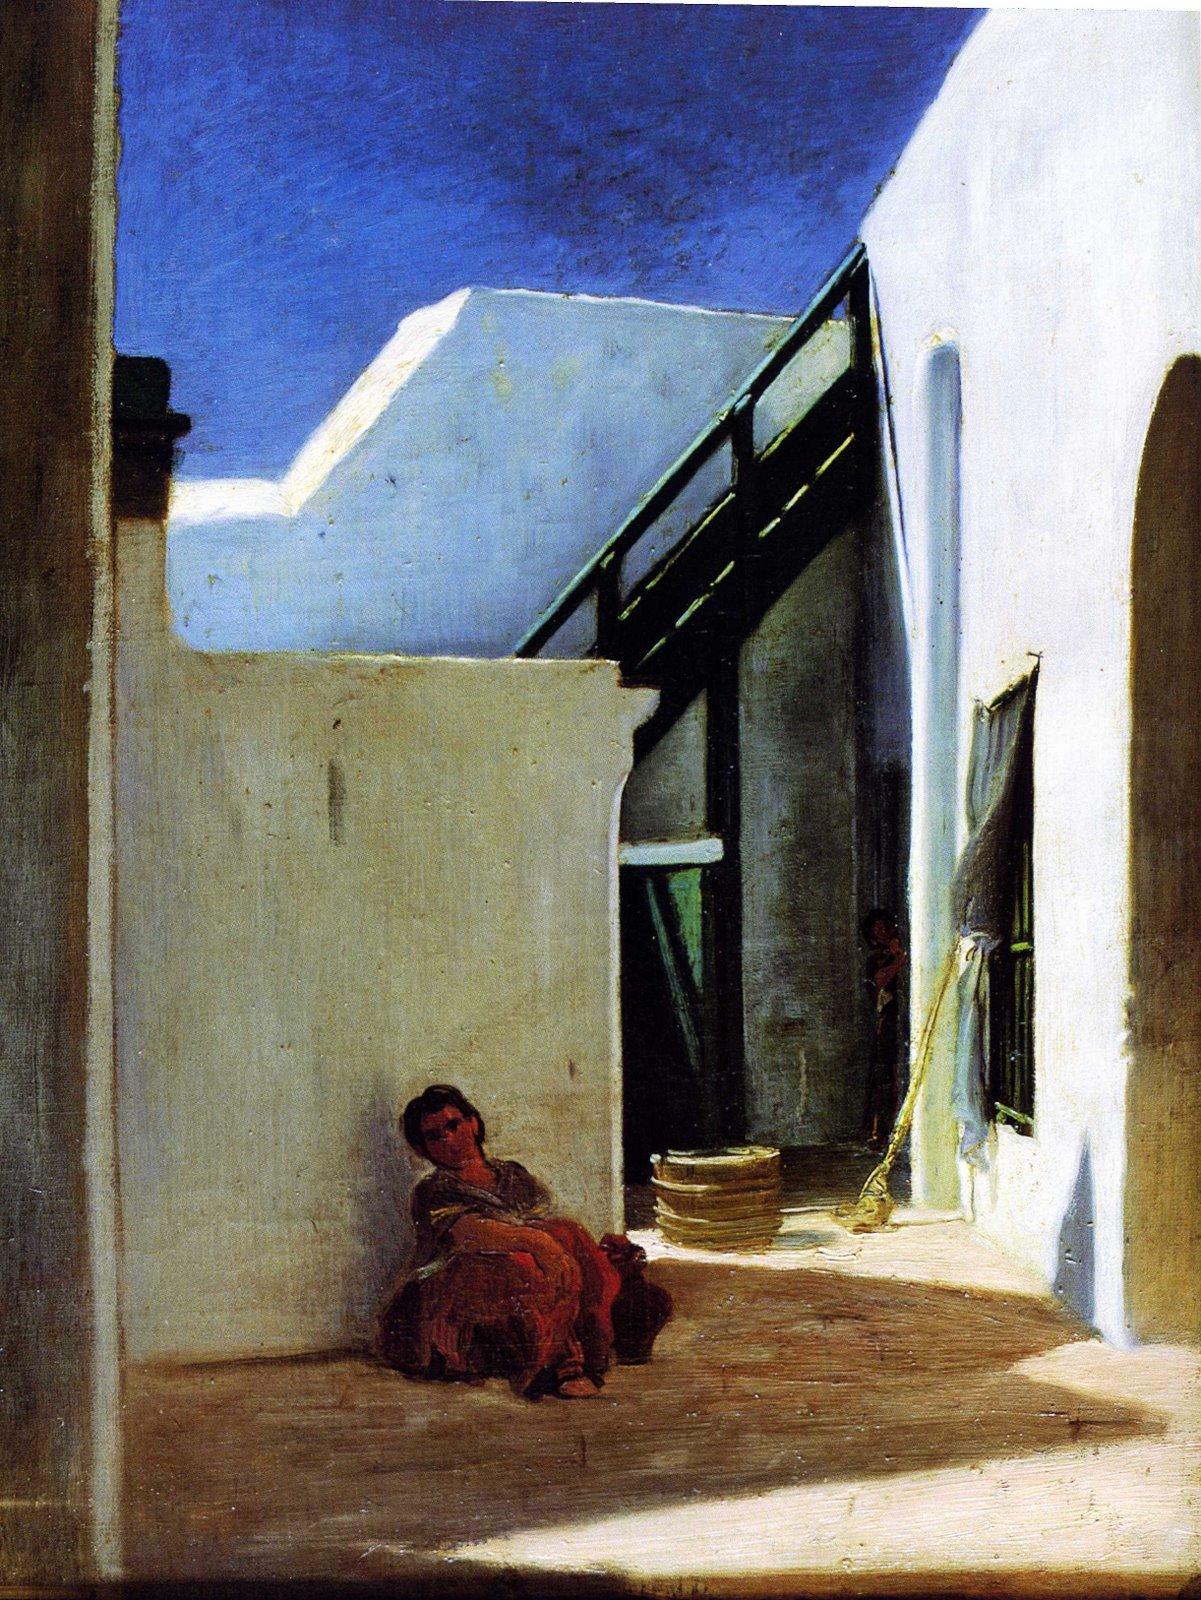 [Alfred+Dehodencq.++Interior+of+a+Moroccan+Courtyard,+1860..jpg]